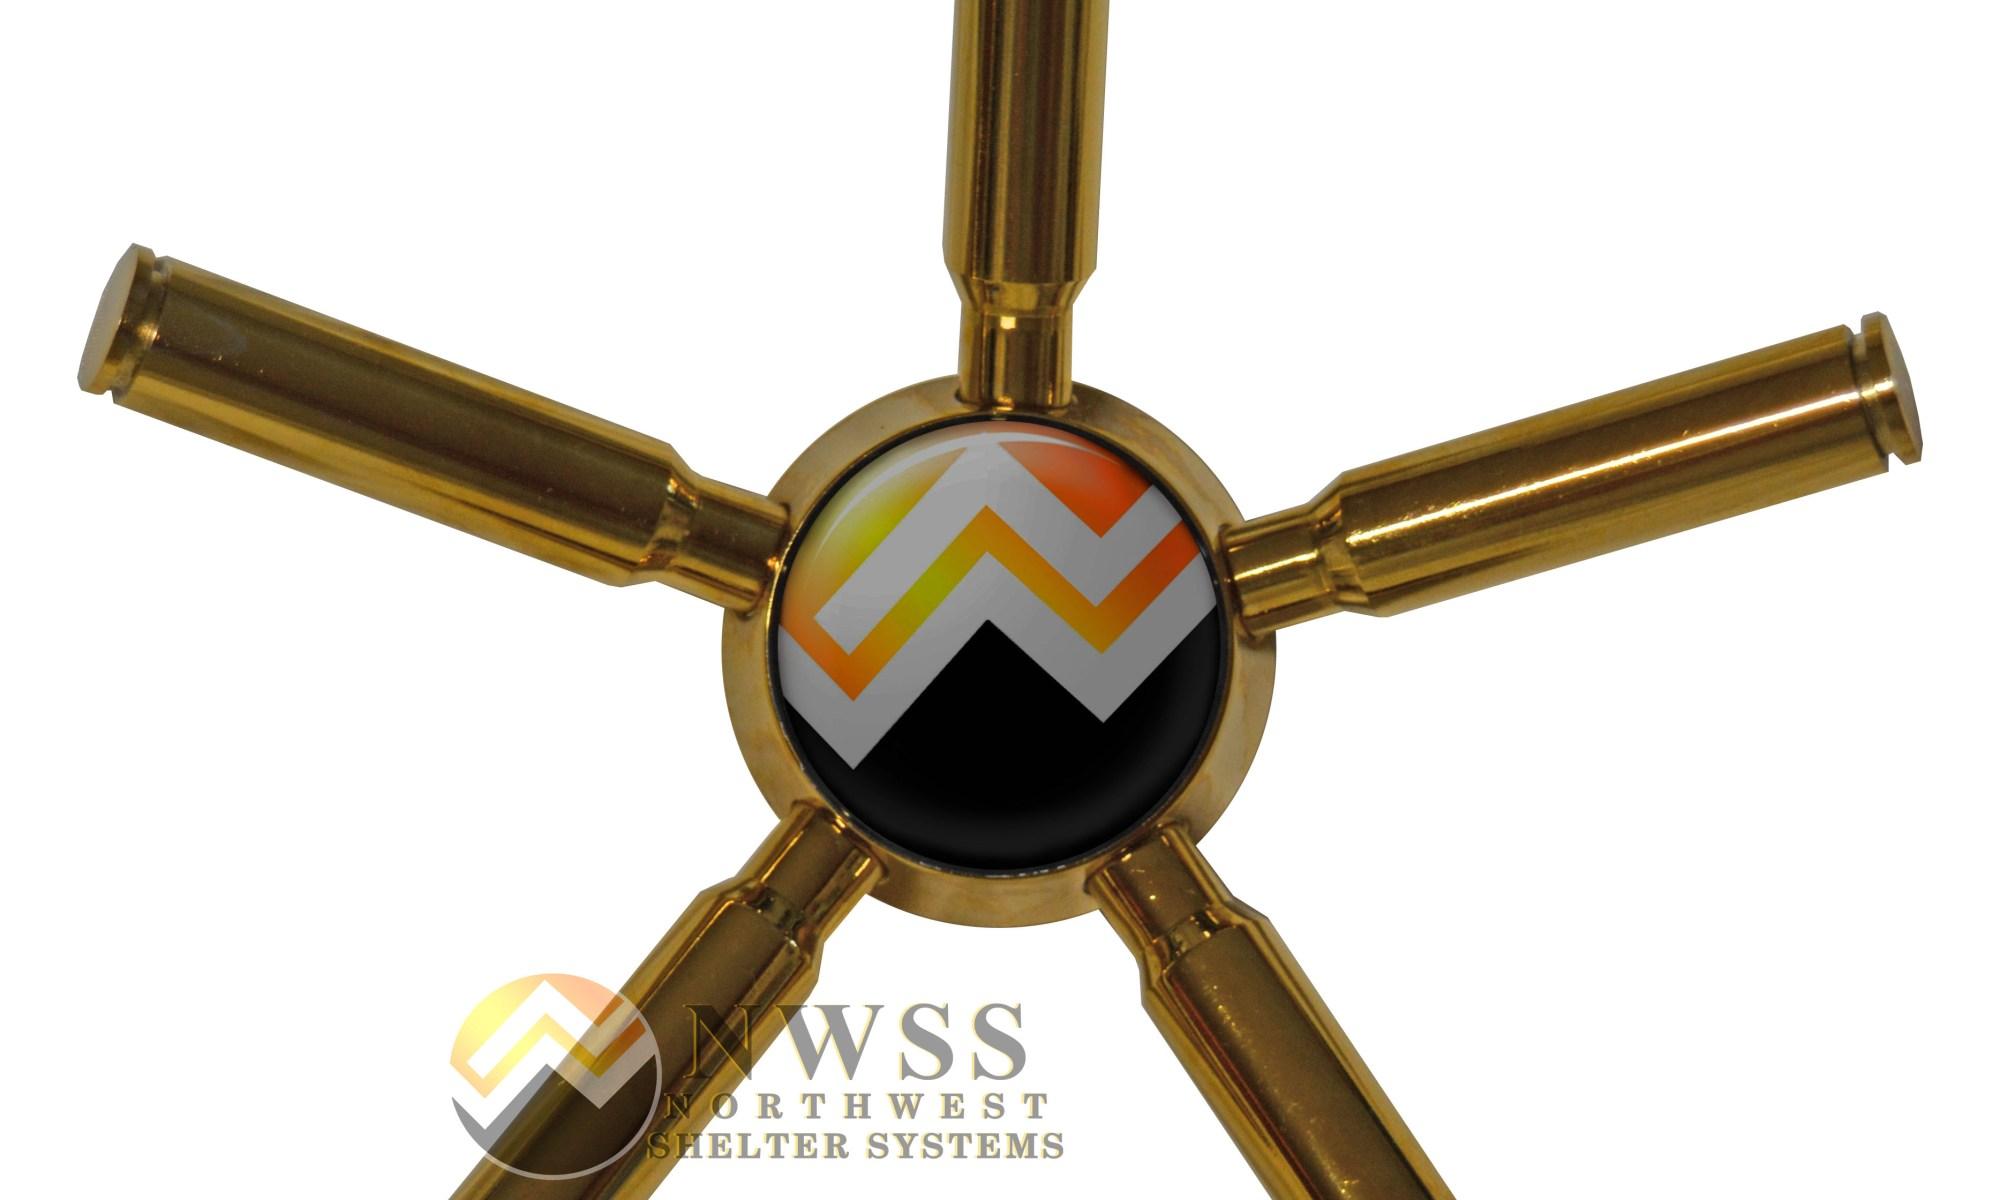 5 spoke bankers wheel